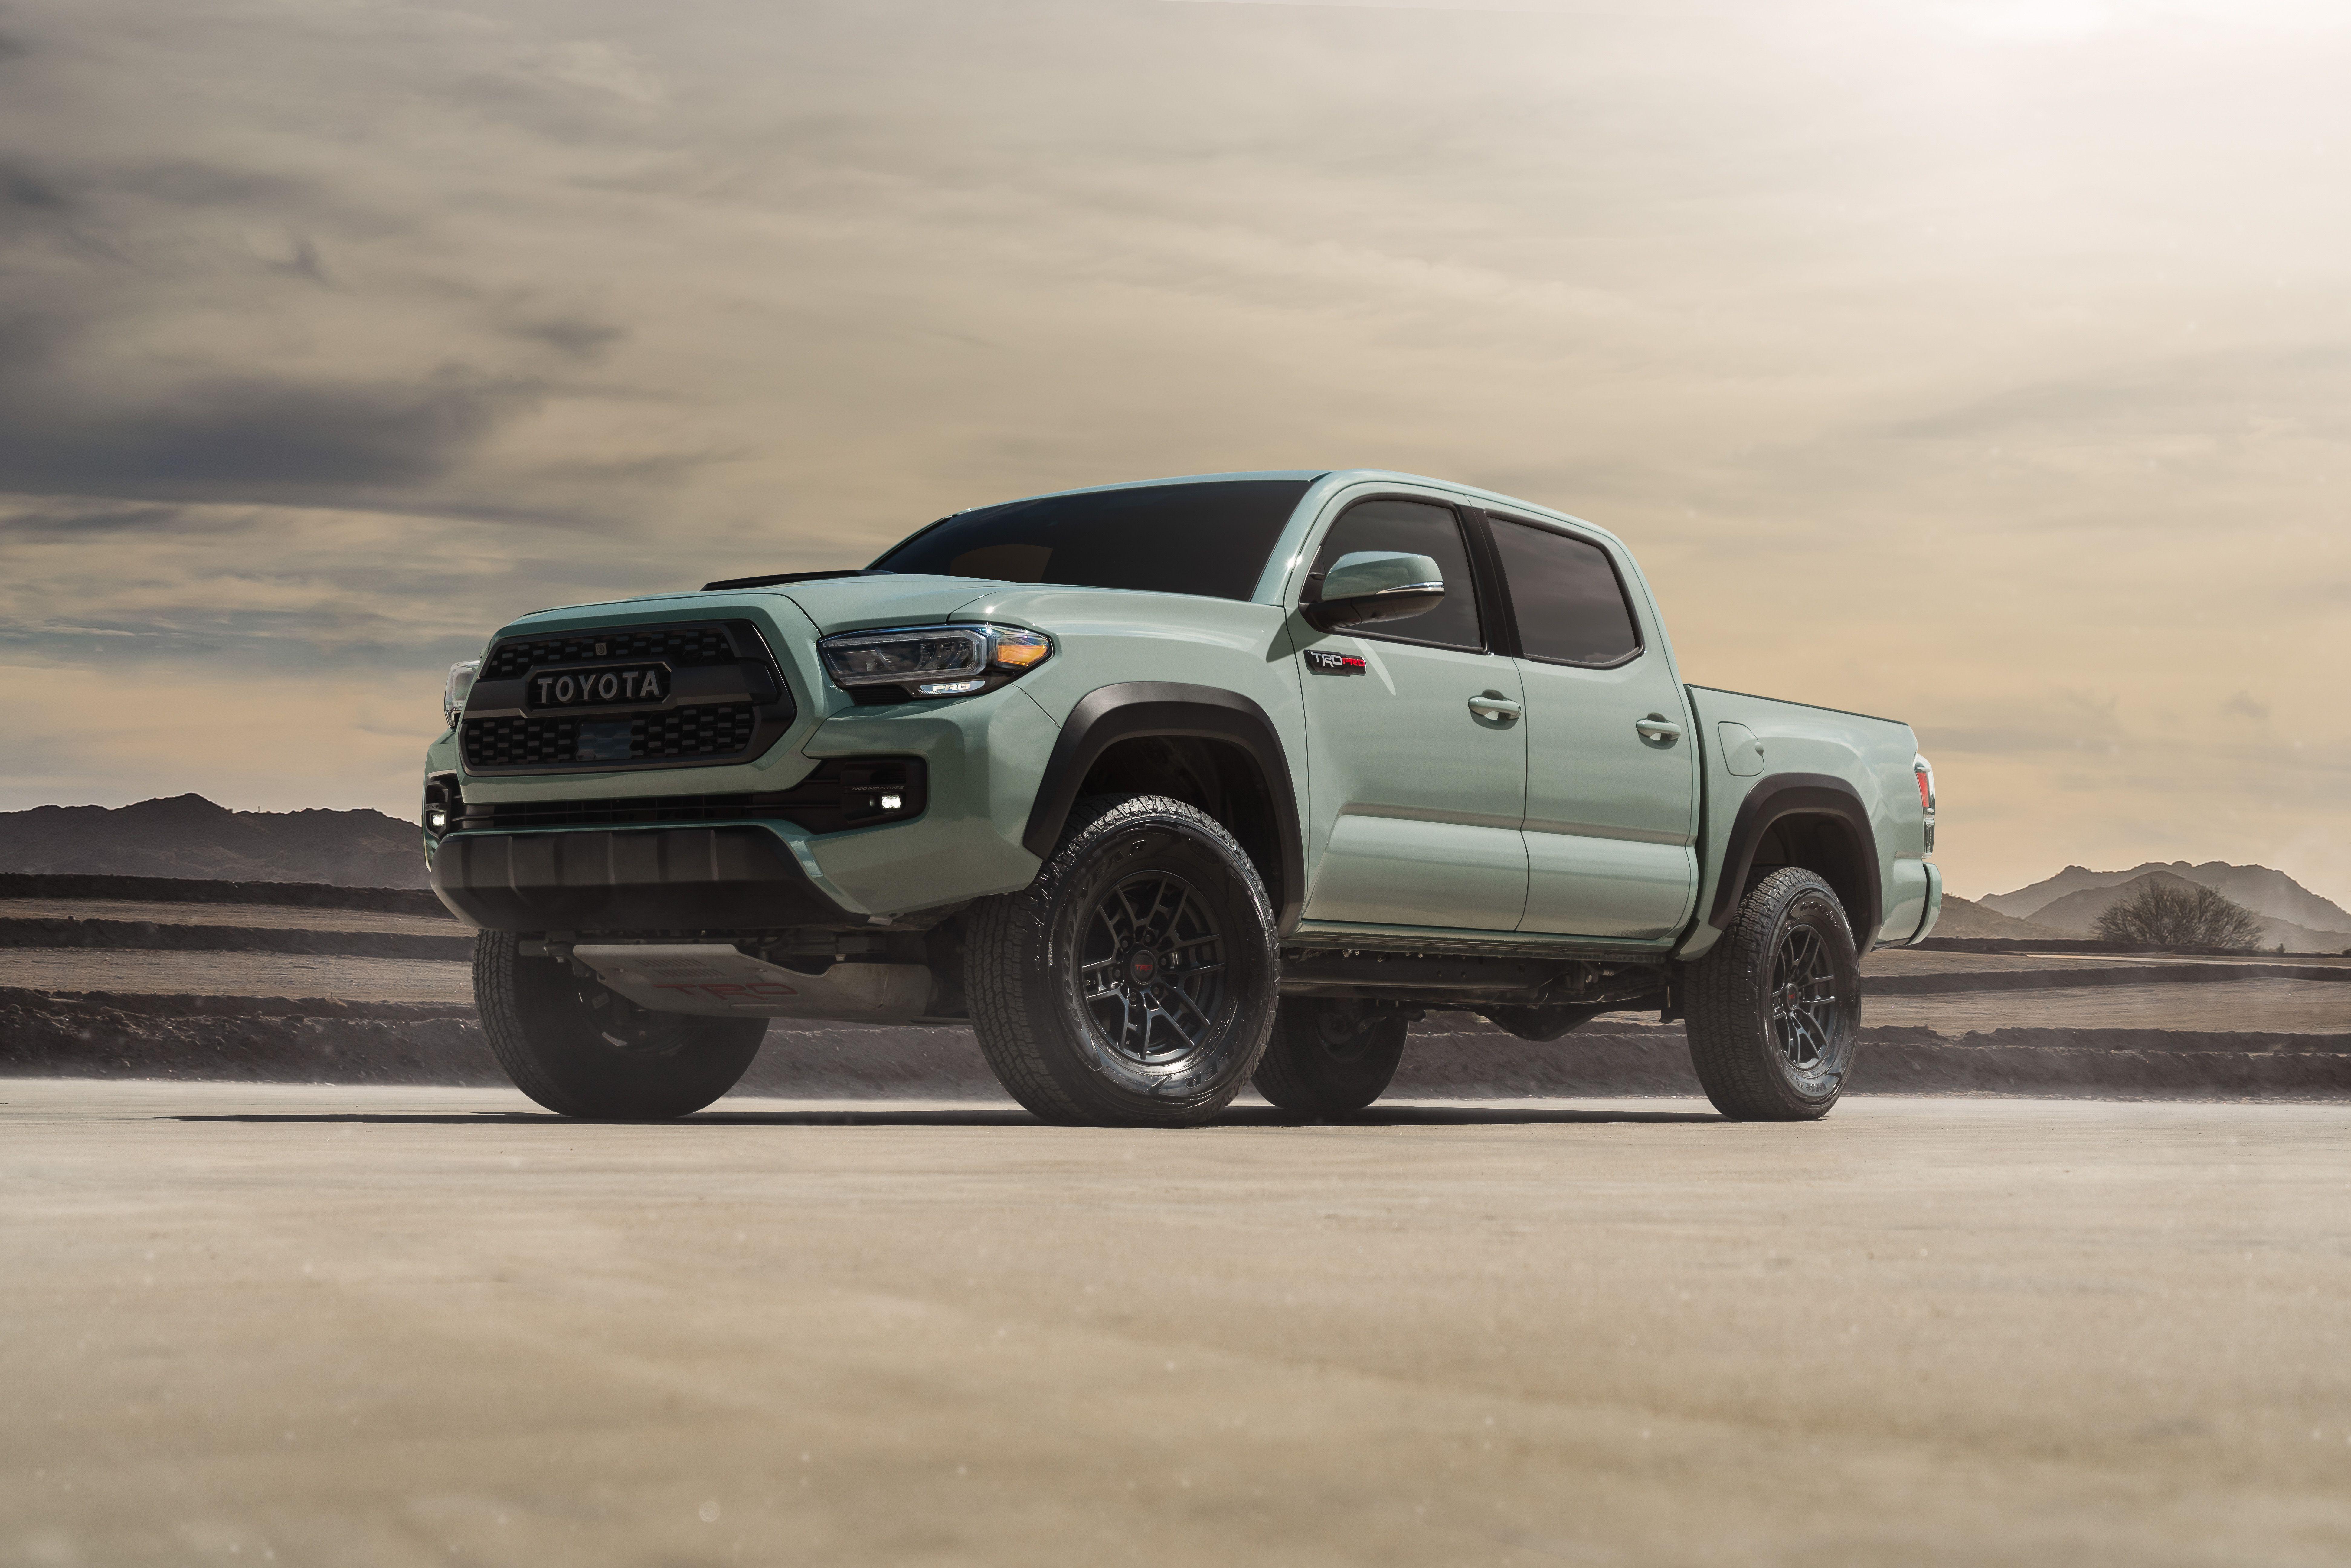 2021 toyota tacoma 4k 1602354973 - 2021 Toyota Tacoma 4k - 2021 Toyota Tacoma 4k wallpapers